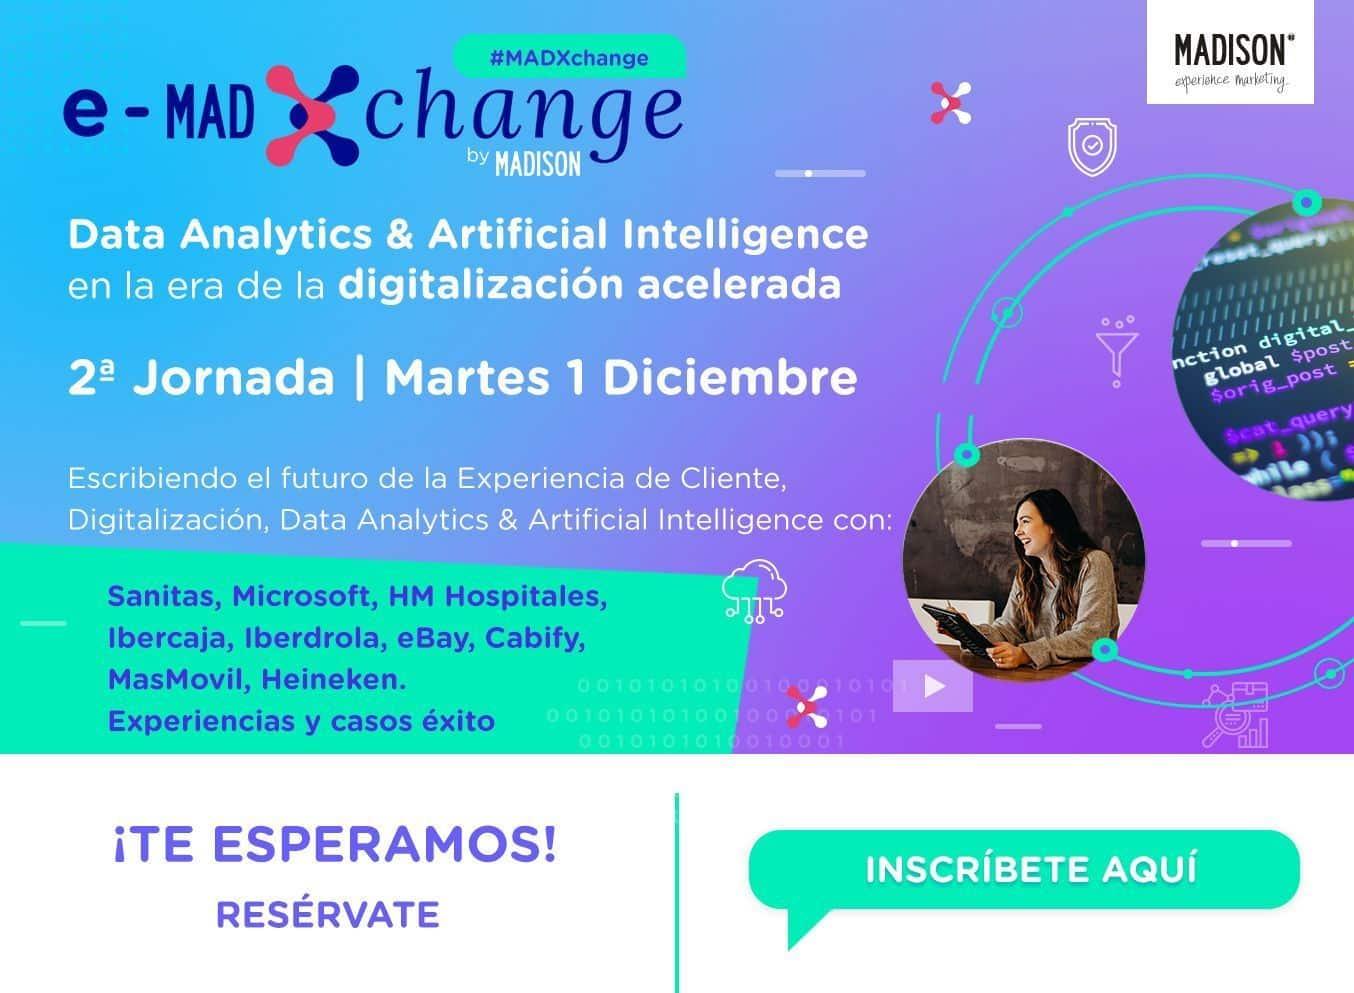 Promocion 1 dic MR_MKT_evento_DATA_eMADXchange_Dia2